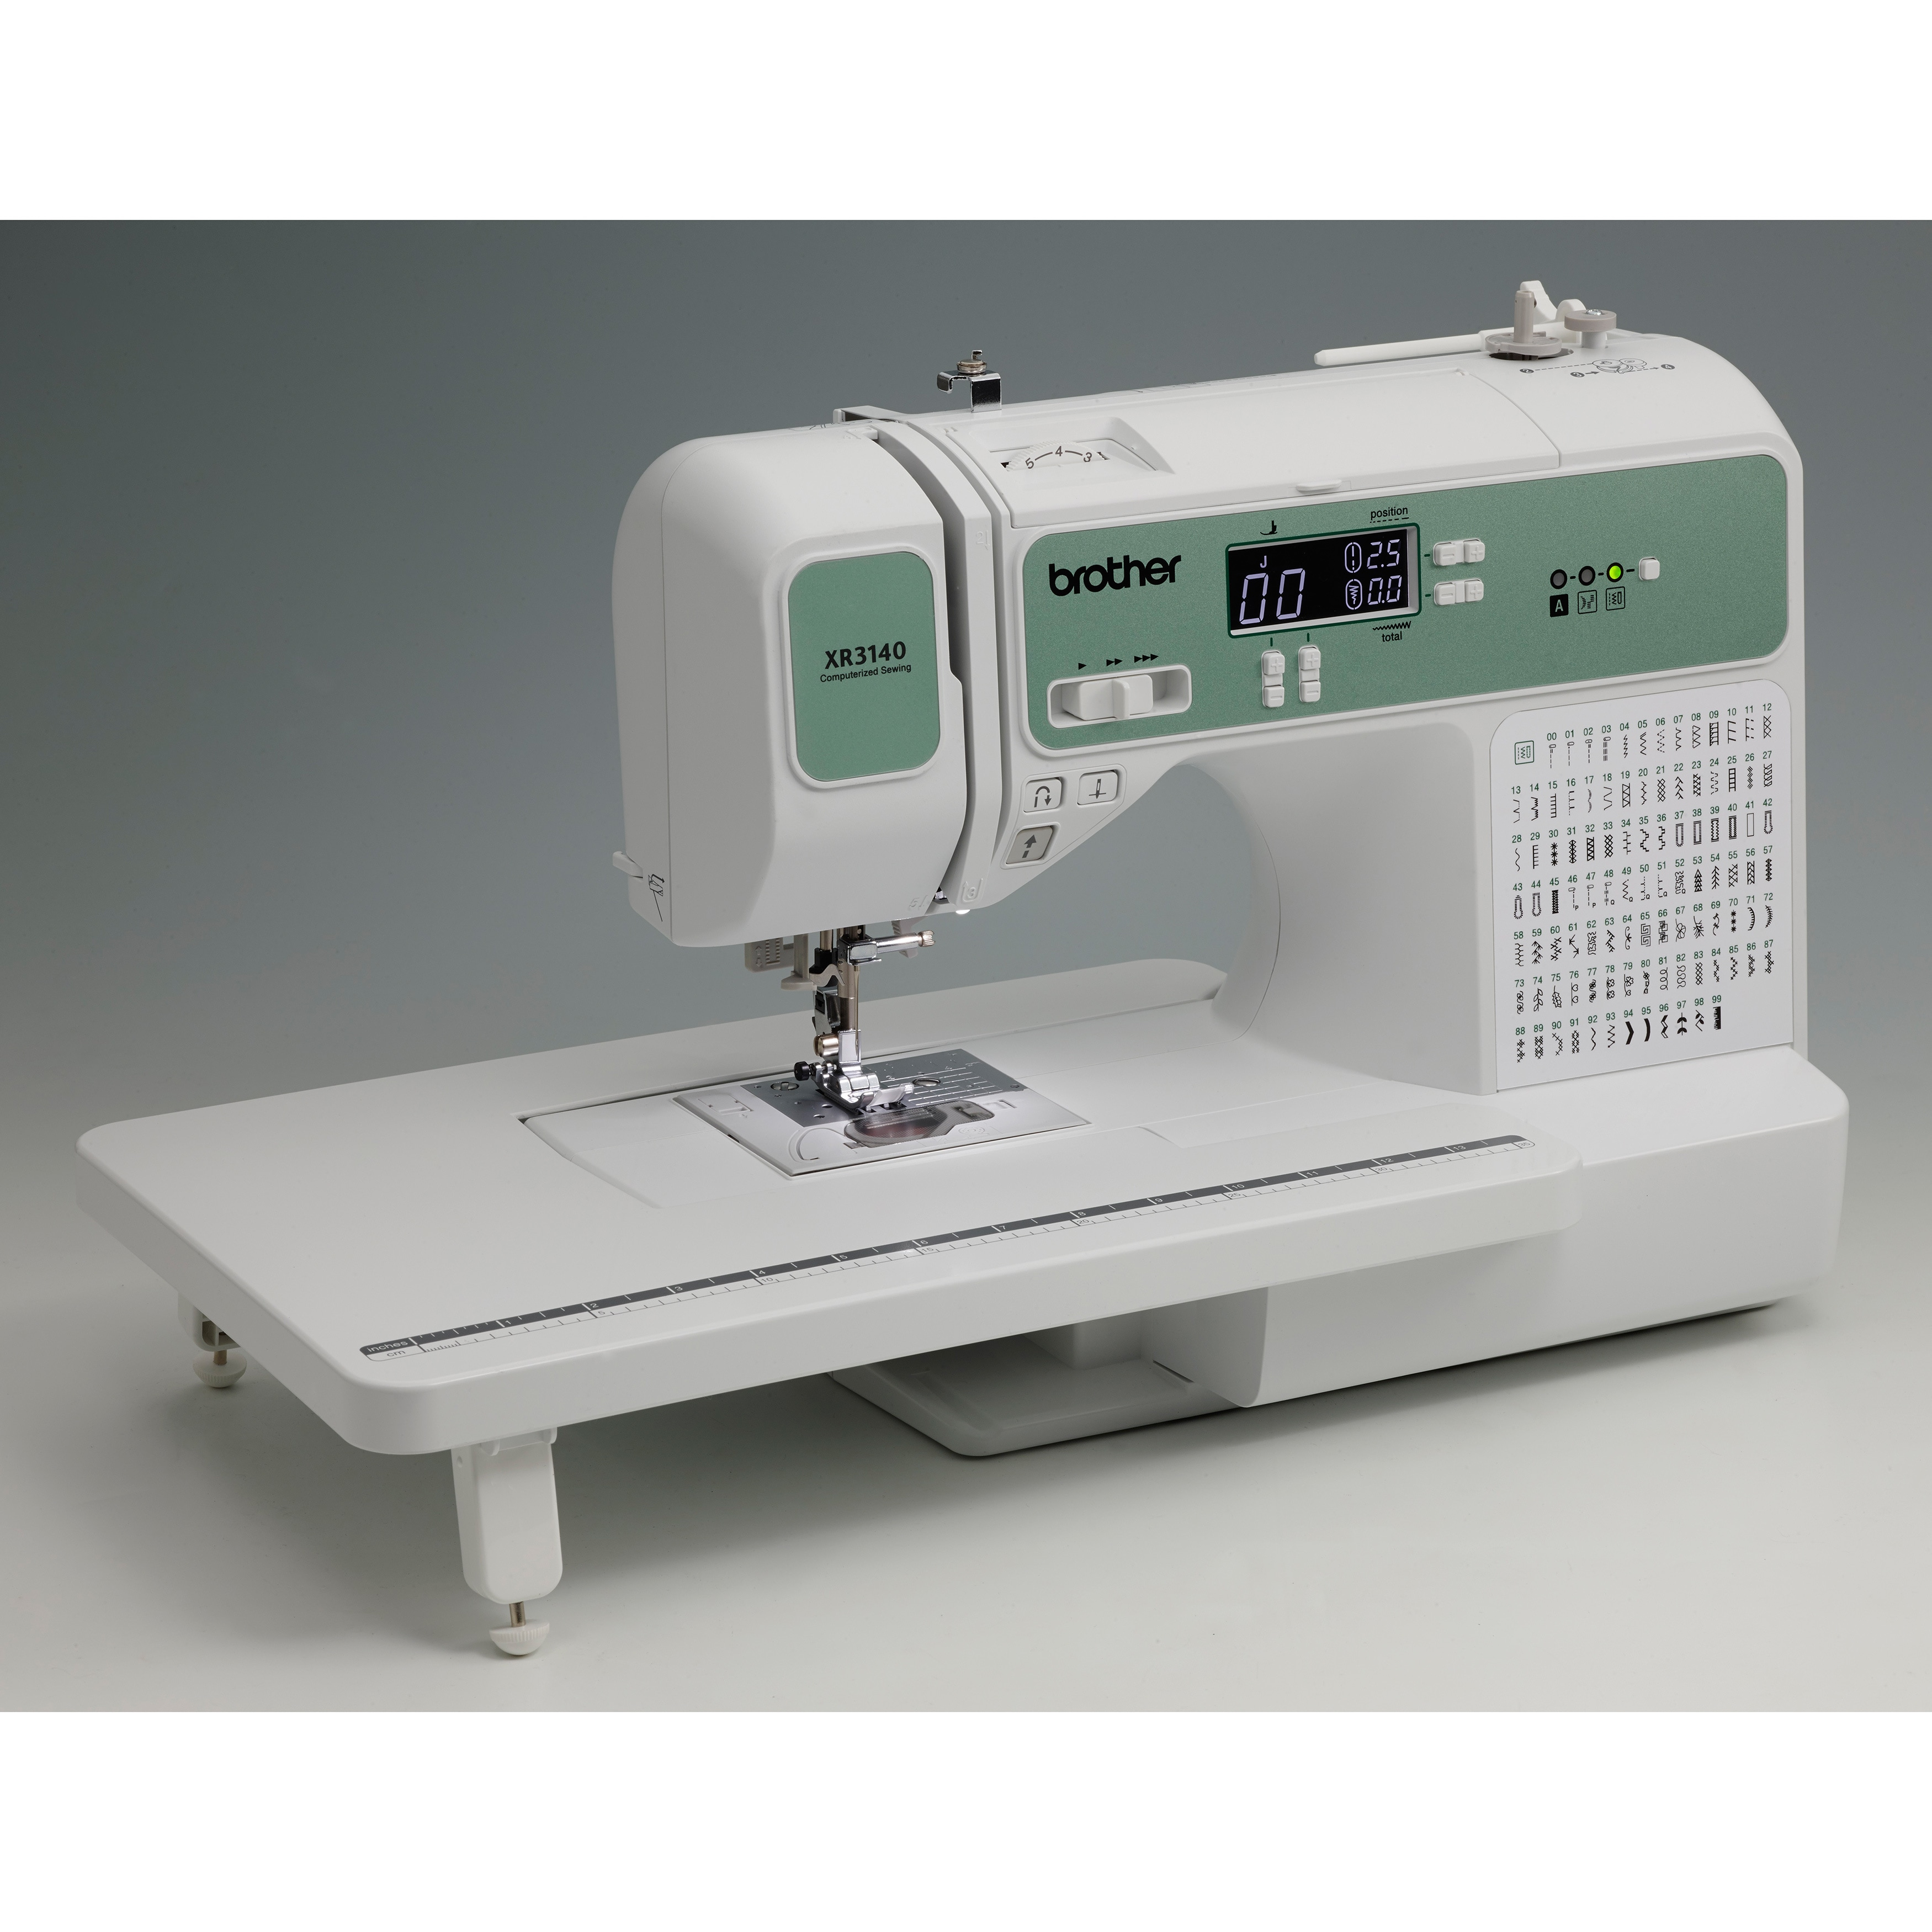 Brother XR3140 140 Stitch Computerized Sewing & Quilting Machine ... : quilting machine - Adamdwight.com